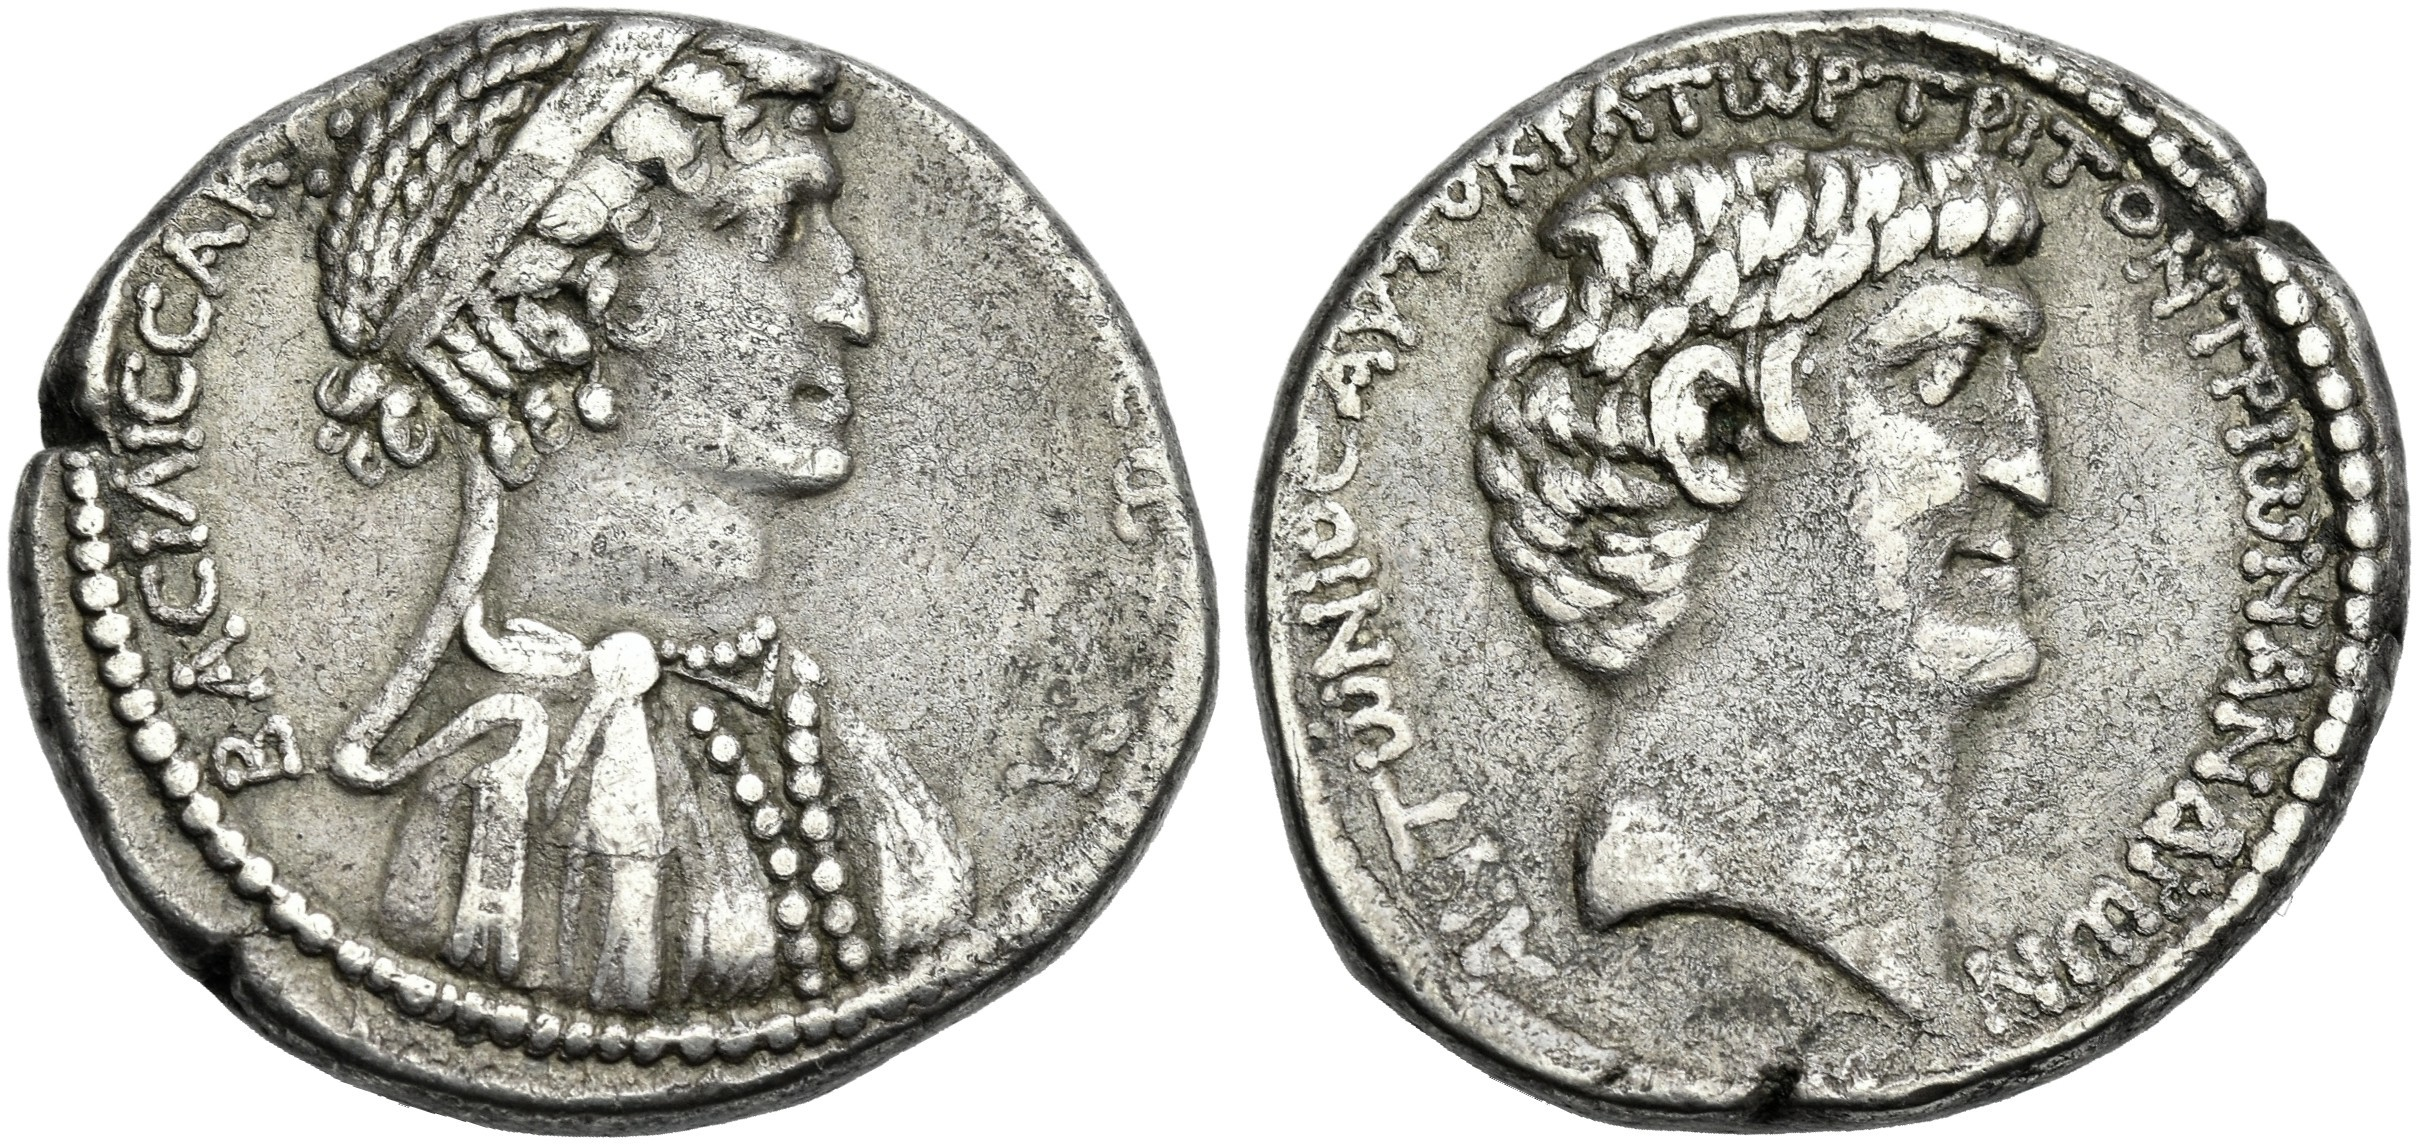 Il nasone di Cleopatra. Numismatica all'asta, online